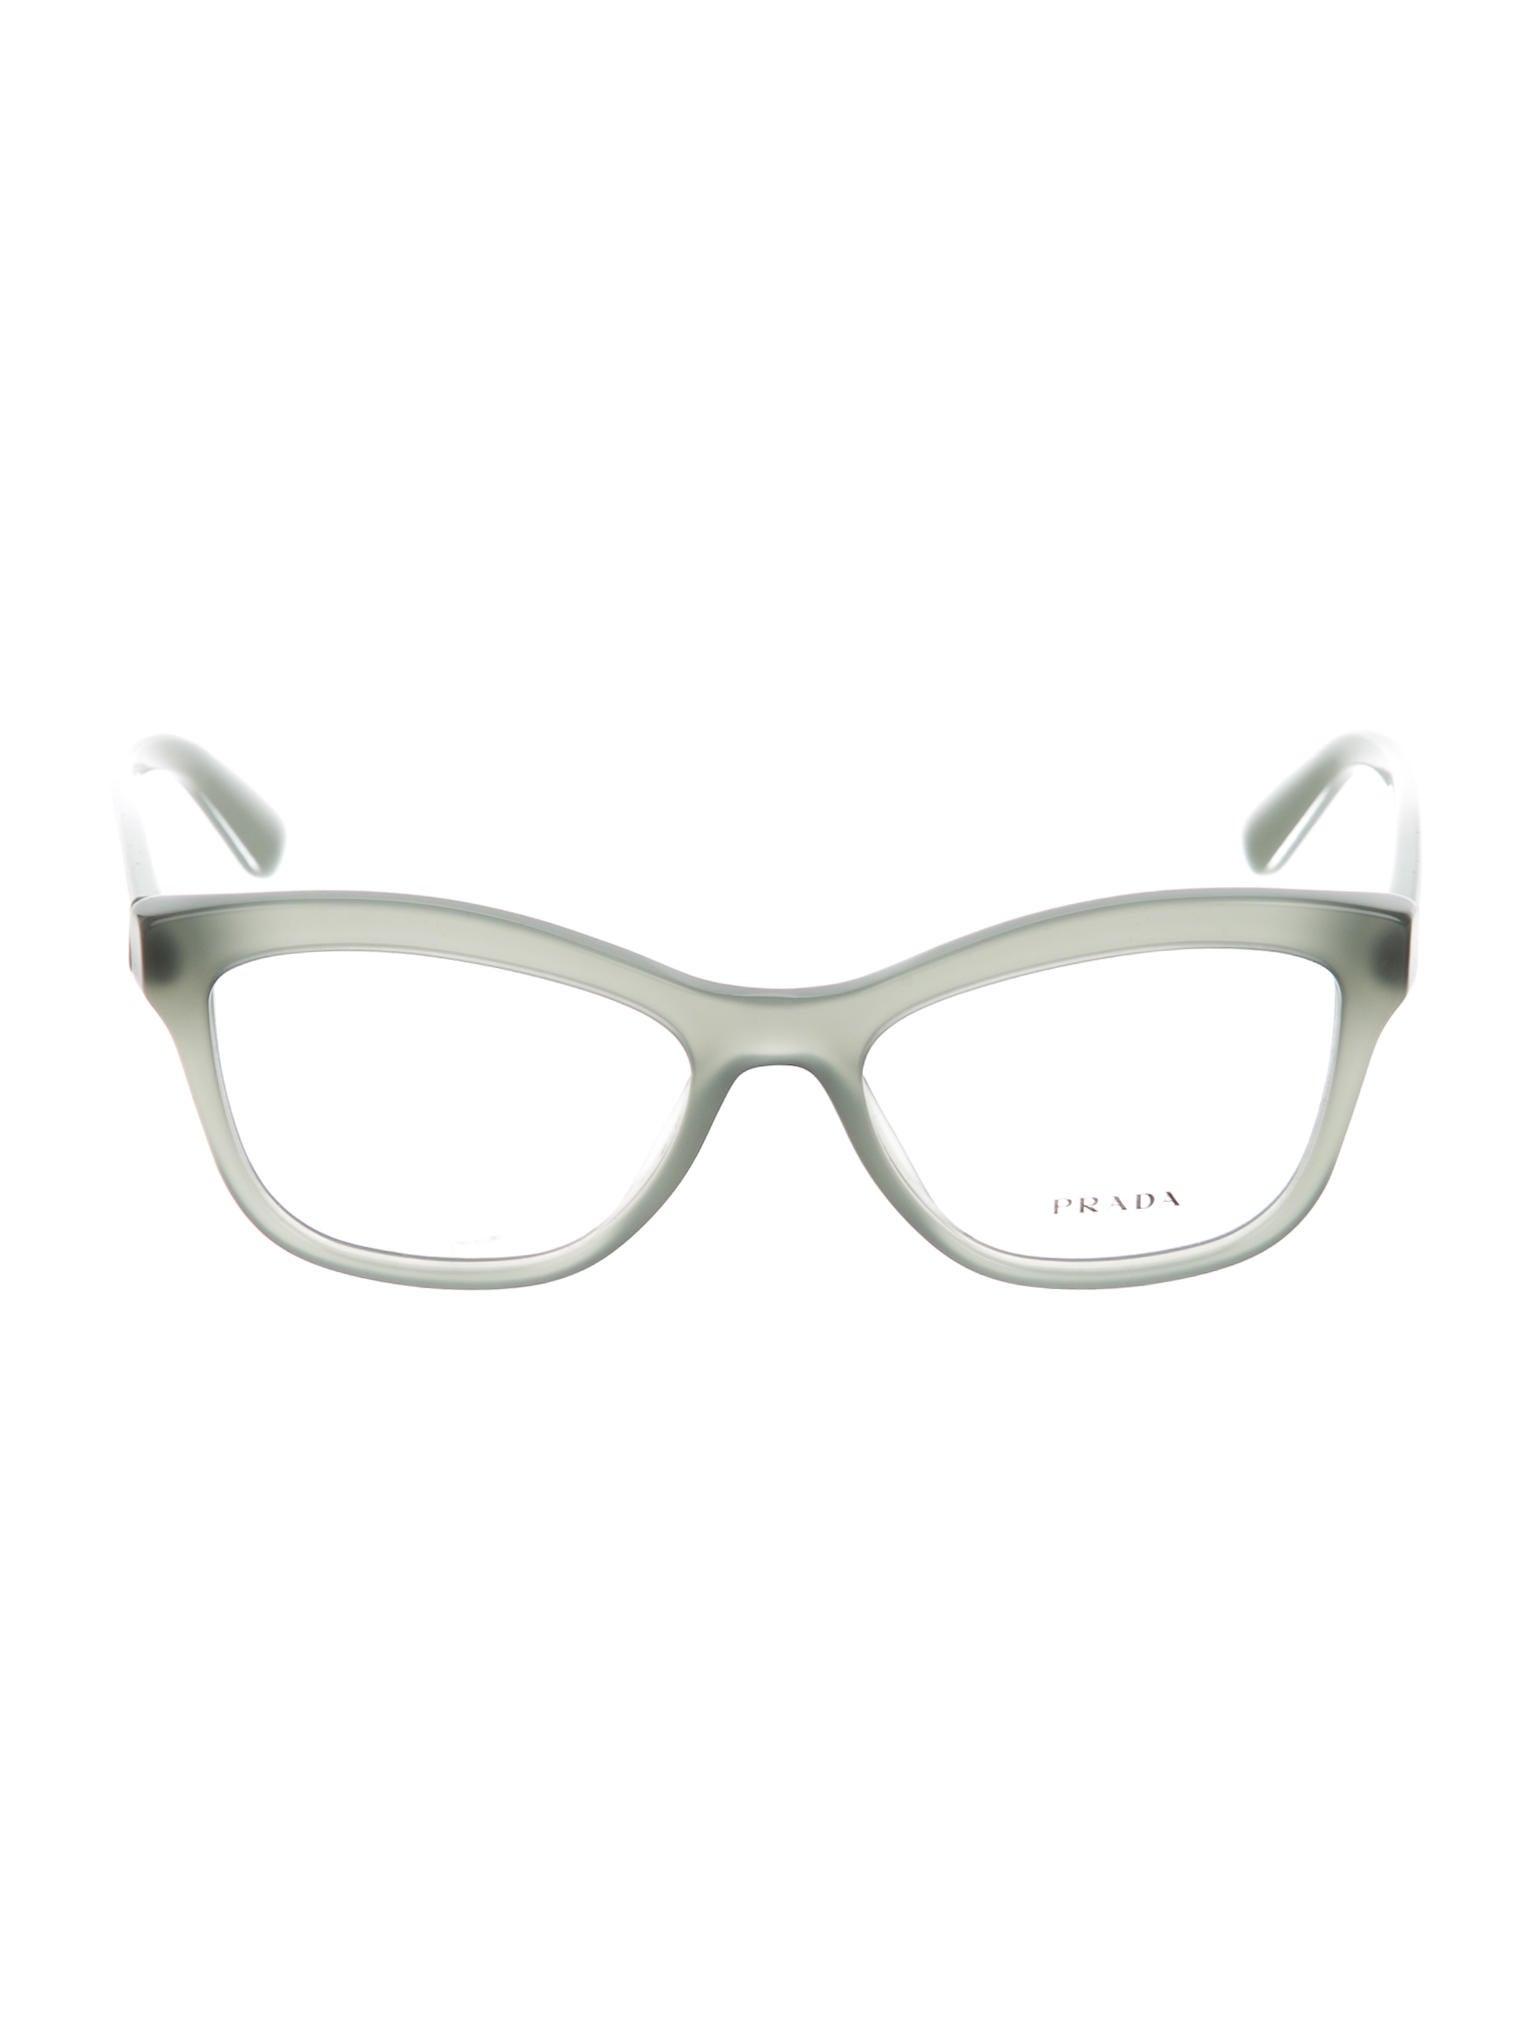 Prada Cat-Eye Logo Eyeglasses w/ Tags - Accessories ...